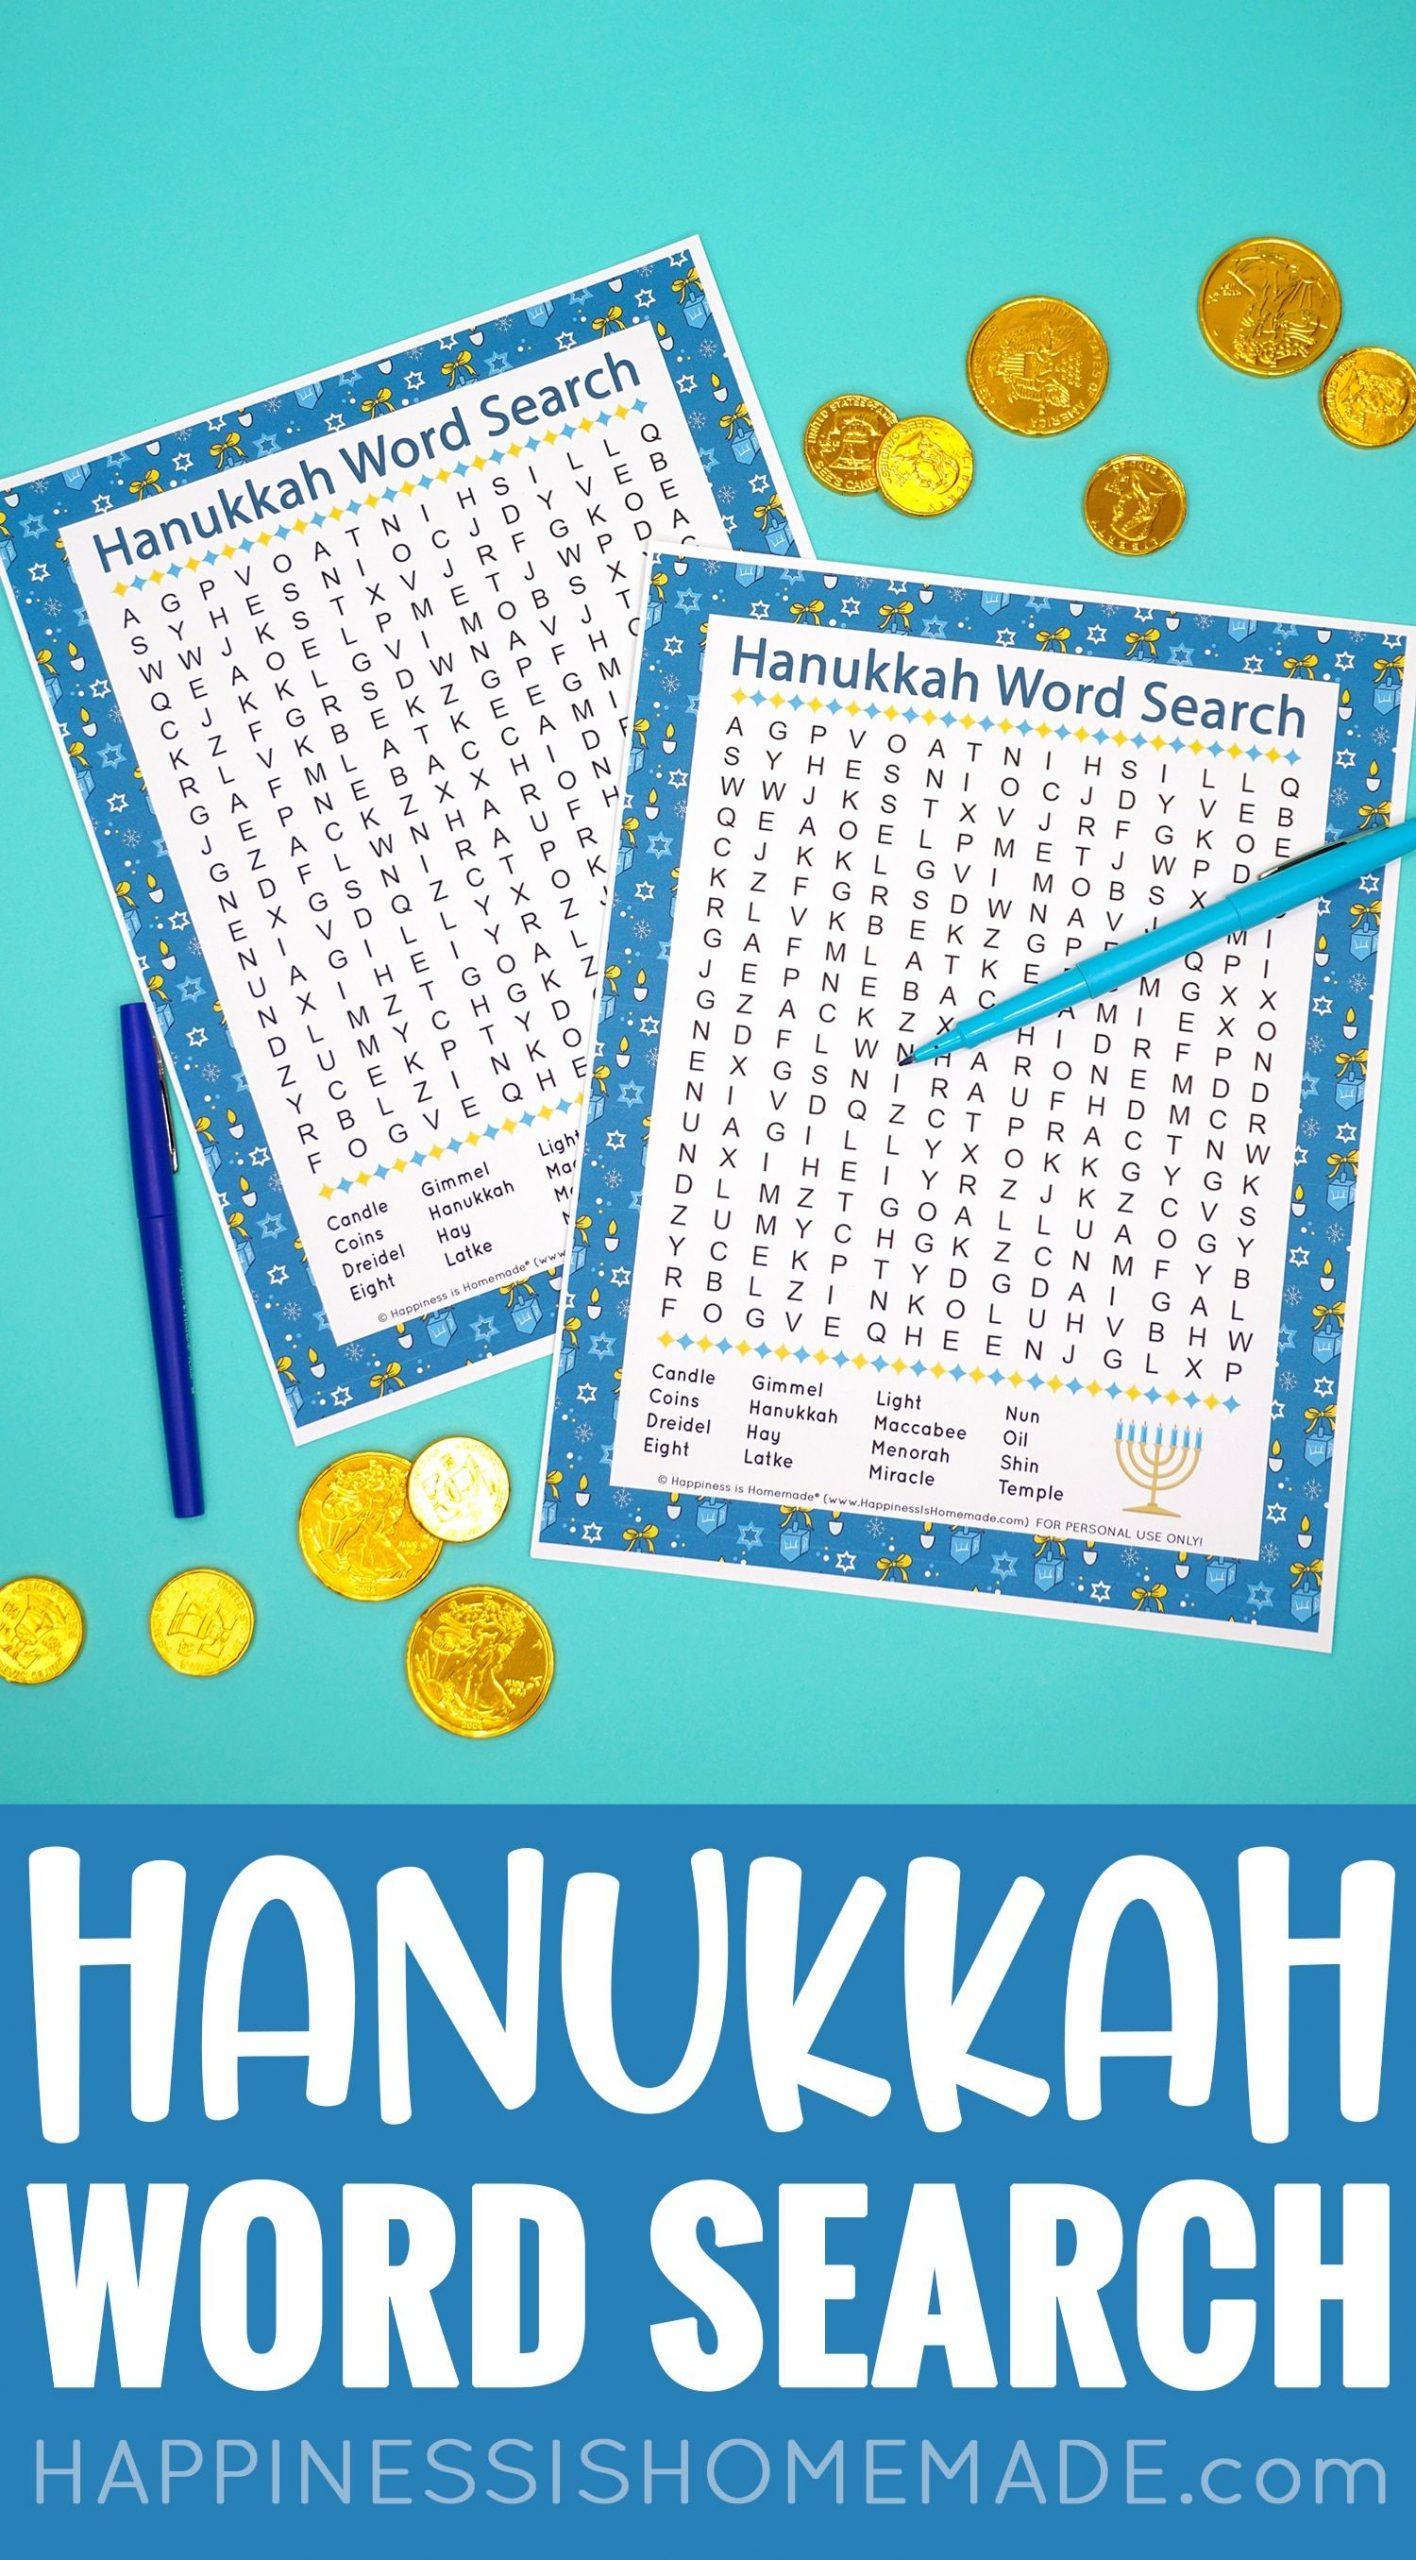 Hanukkah Word Search: This Fun Printable Hanukkah Word